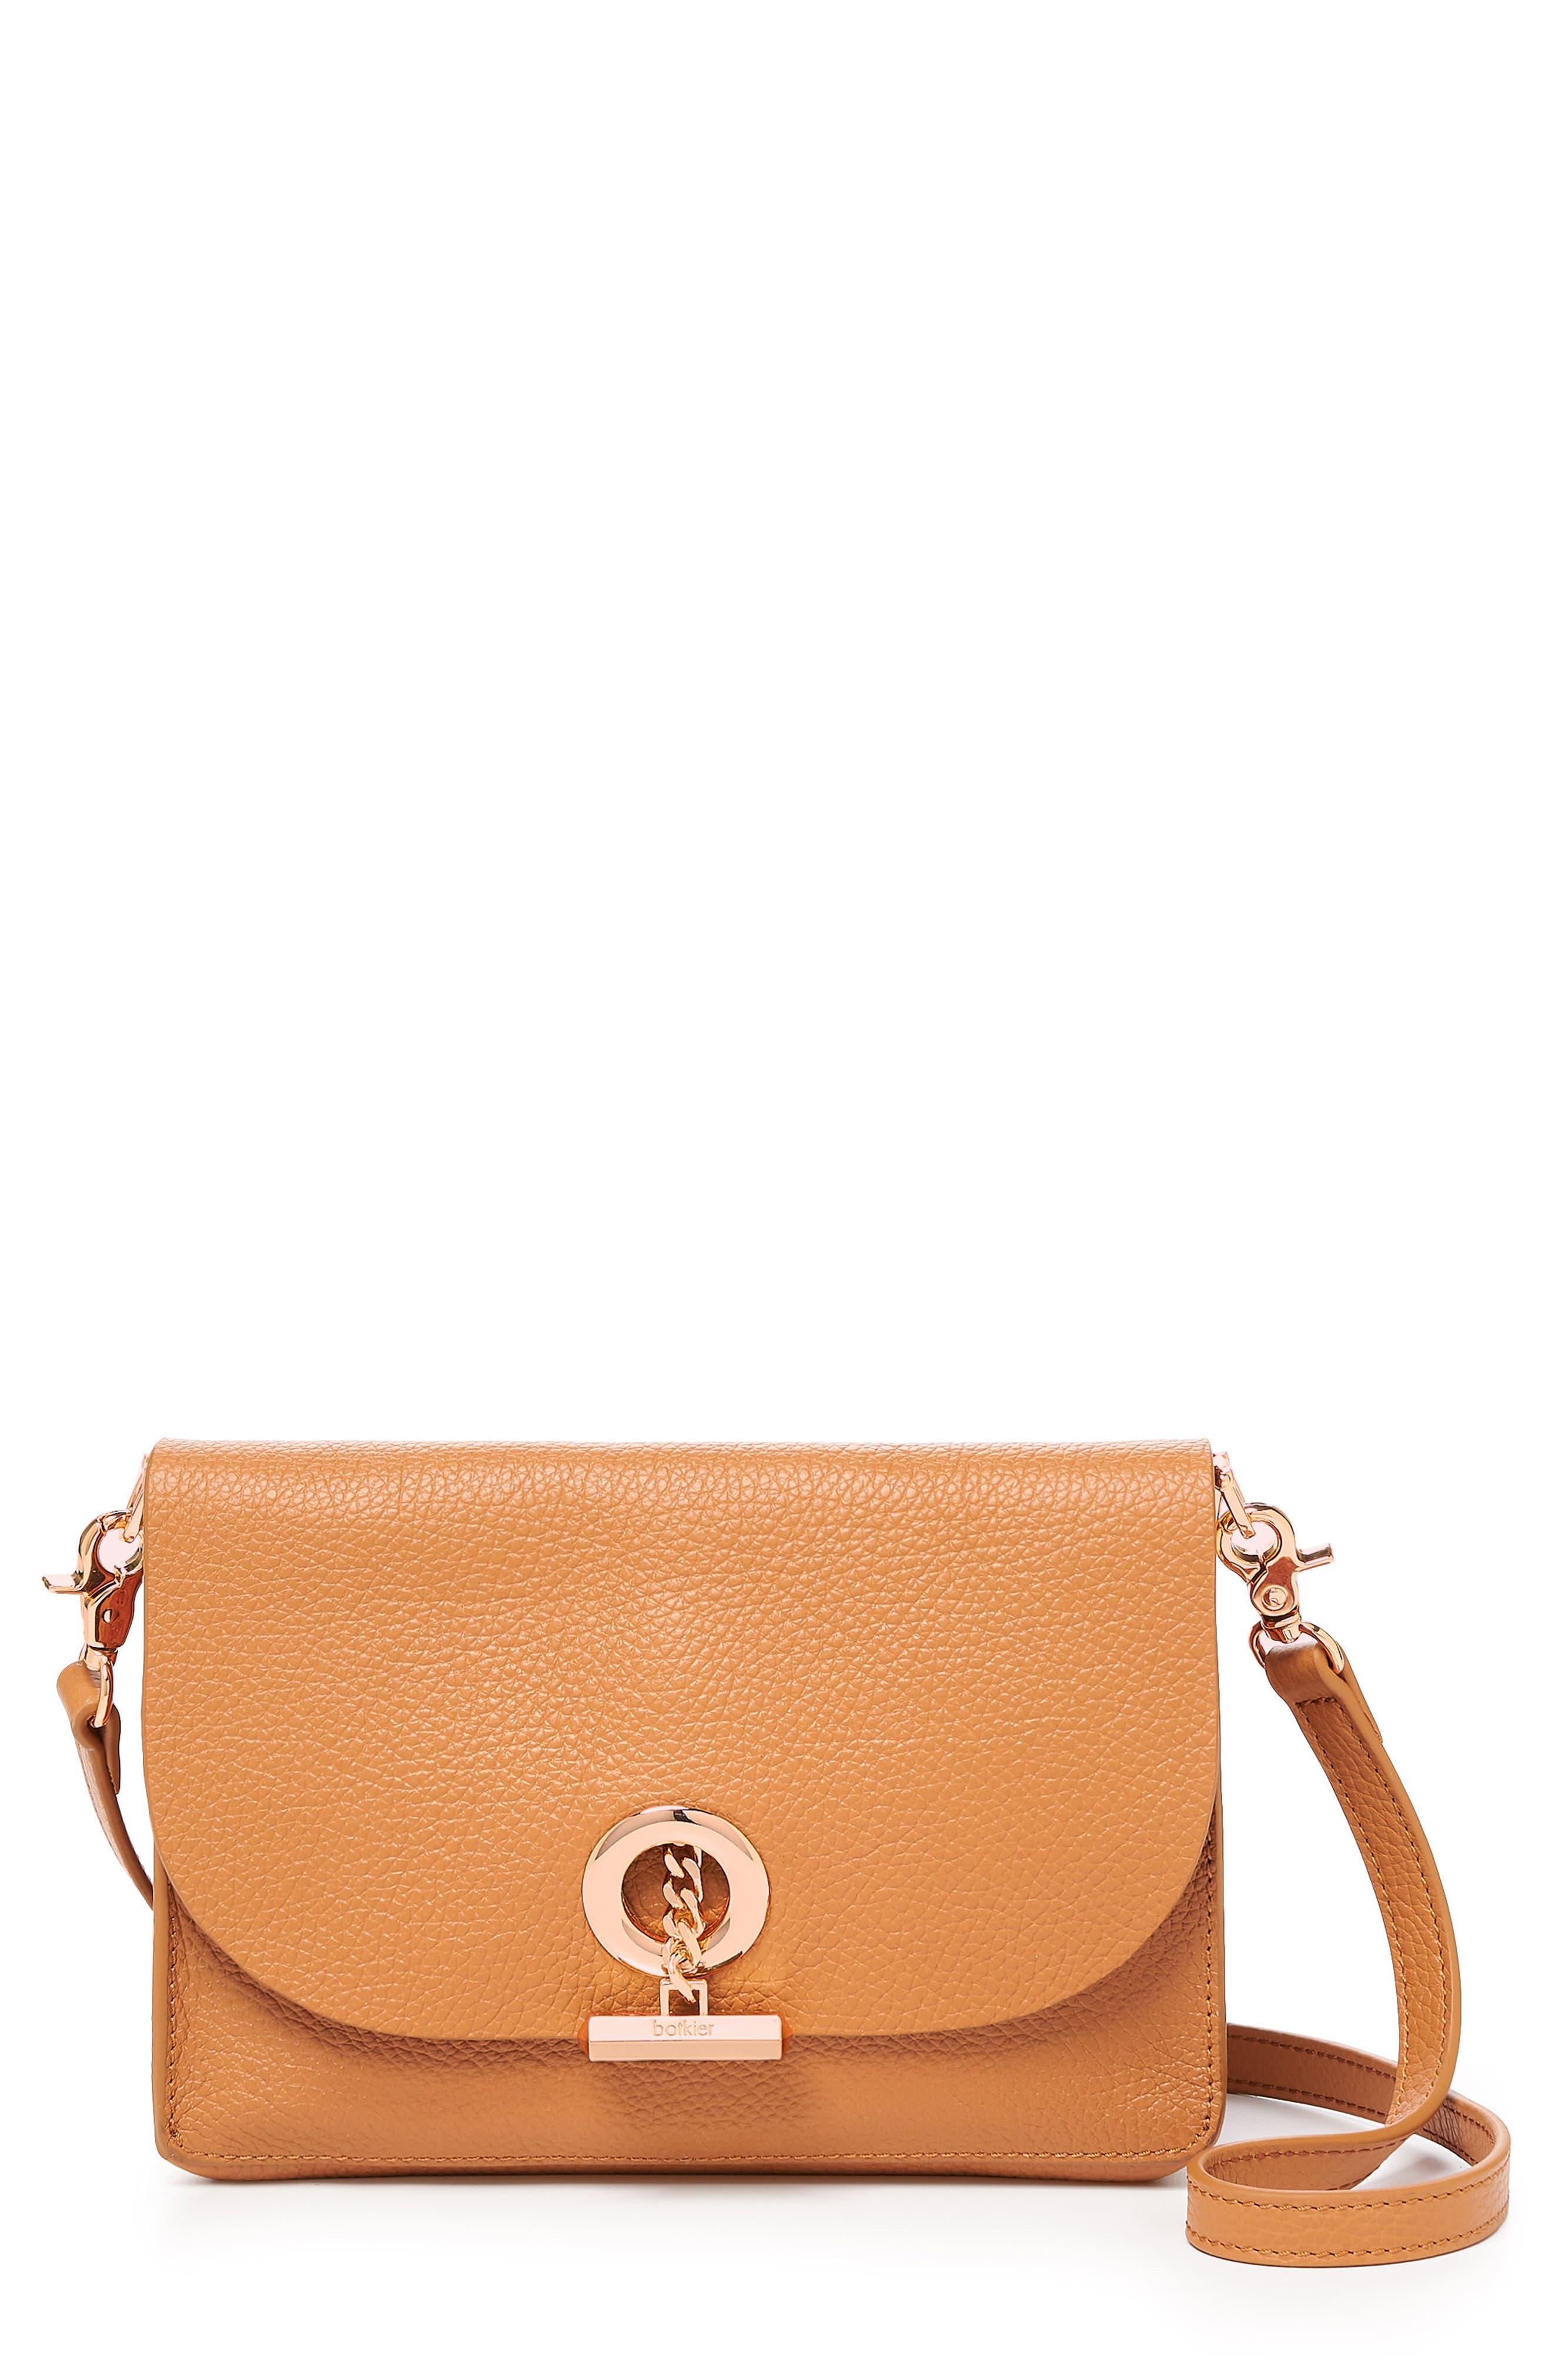 Waverly Leather Crossbody Bag,                             Main thumbnail 3, color,